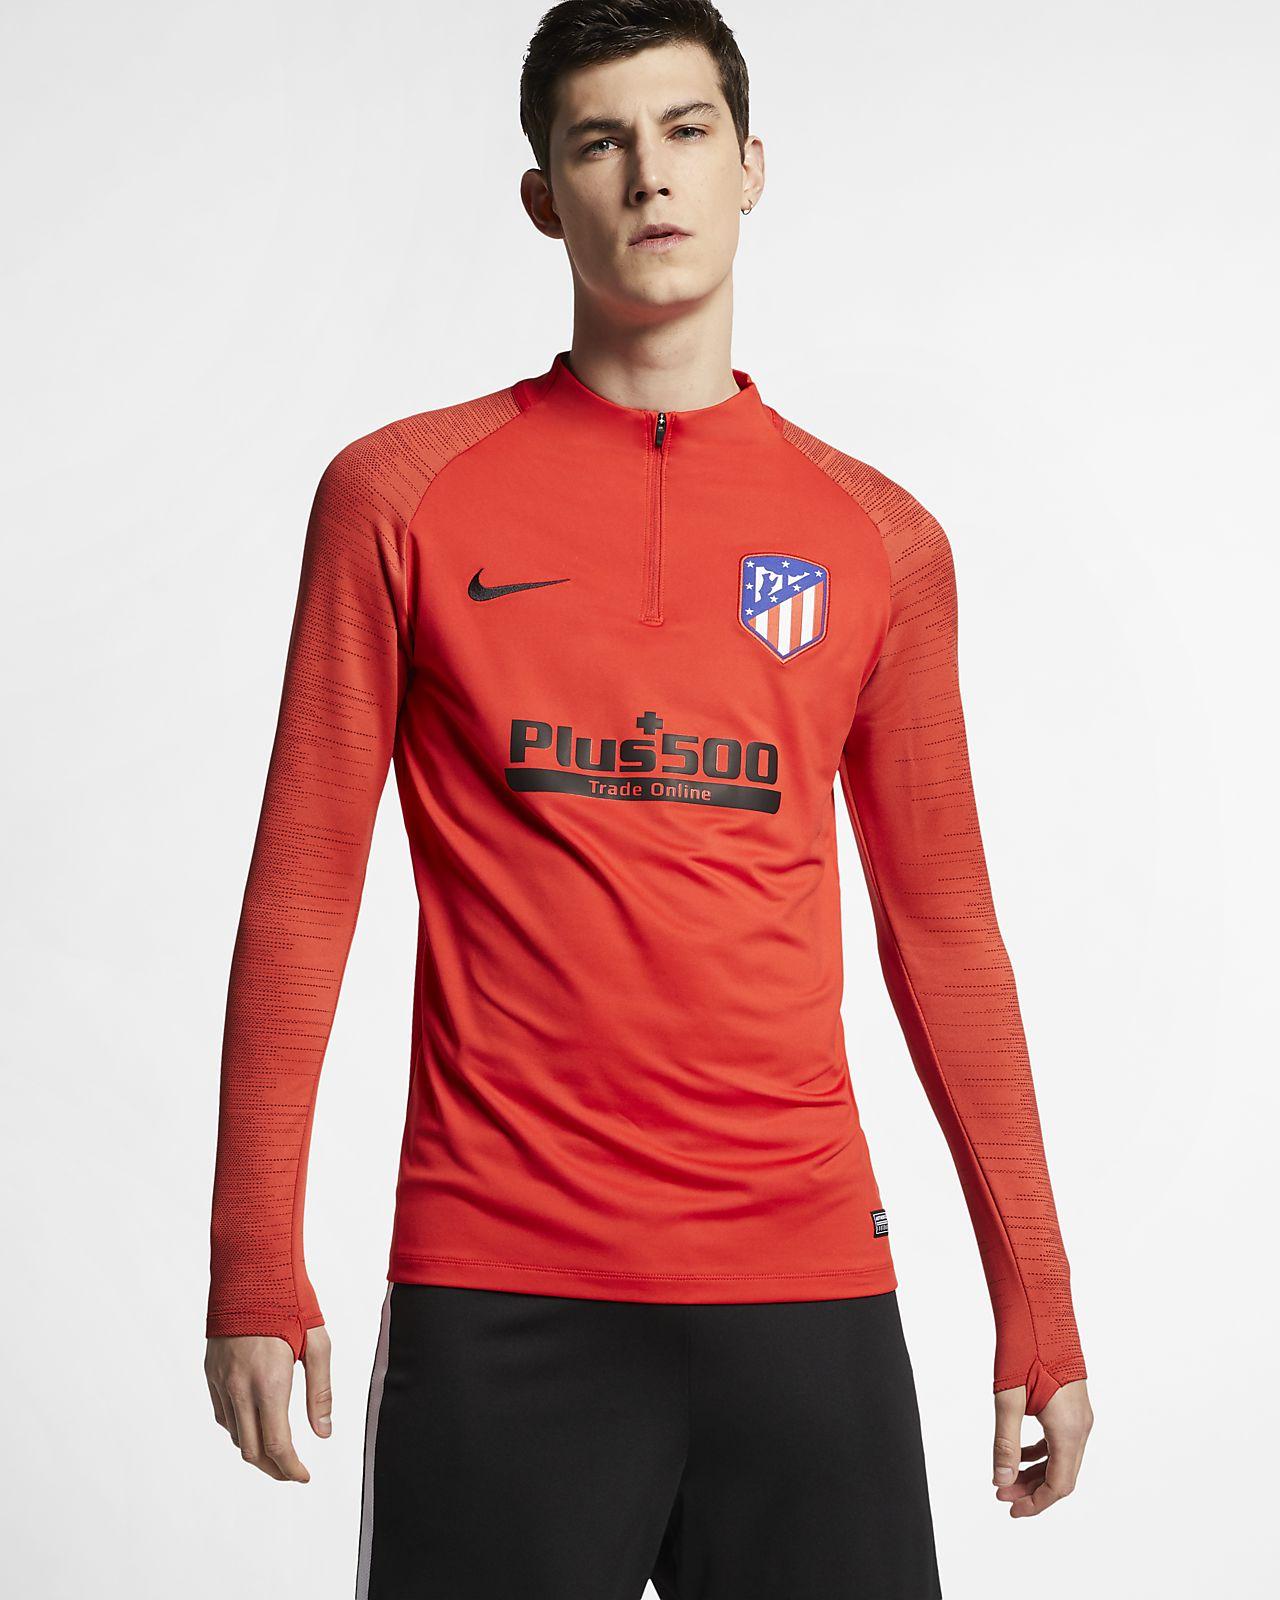 Męska treningowa koszulka piłkarska Nike Dri-FIT Atlético de Madrid Strike